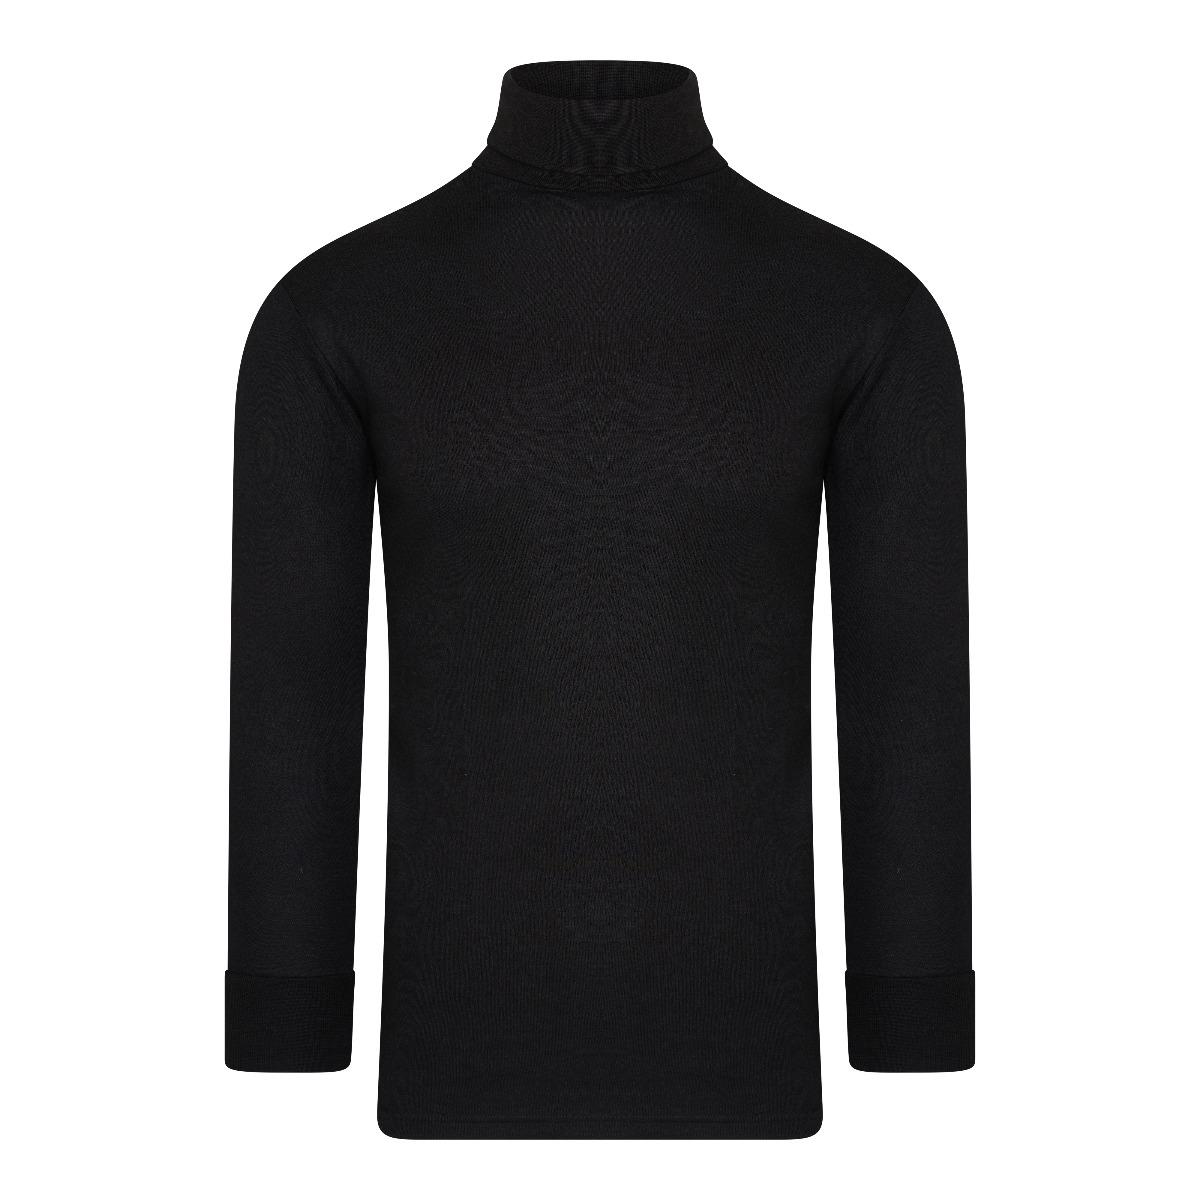 Beeren Thermo Unisex Shirt Col Lange Mouw Zwart M